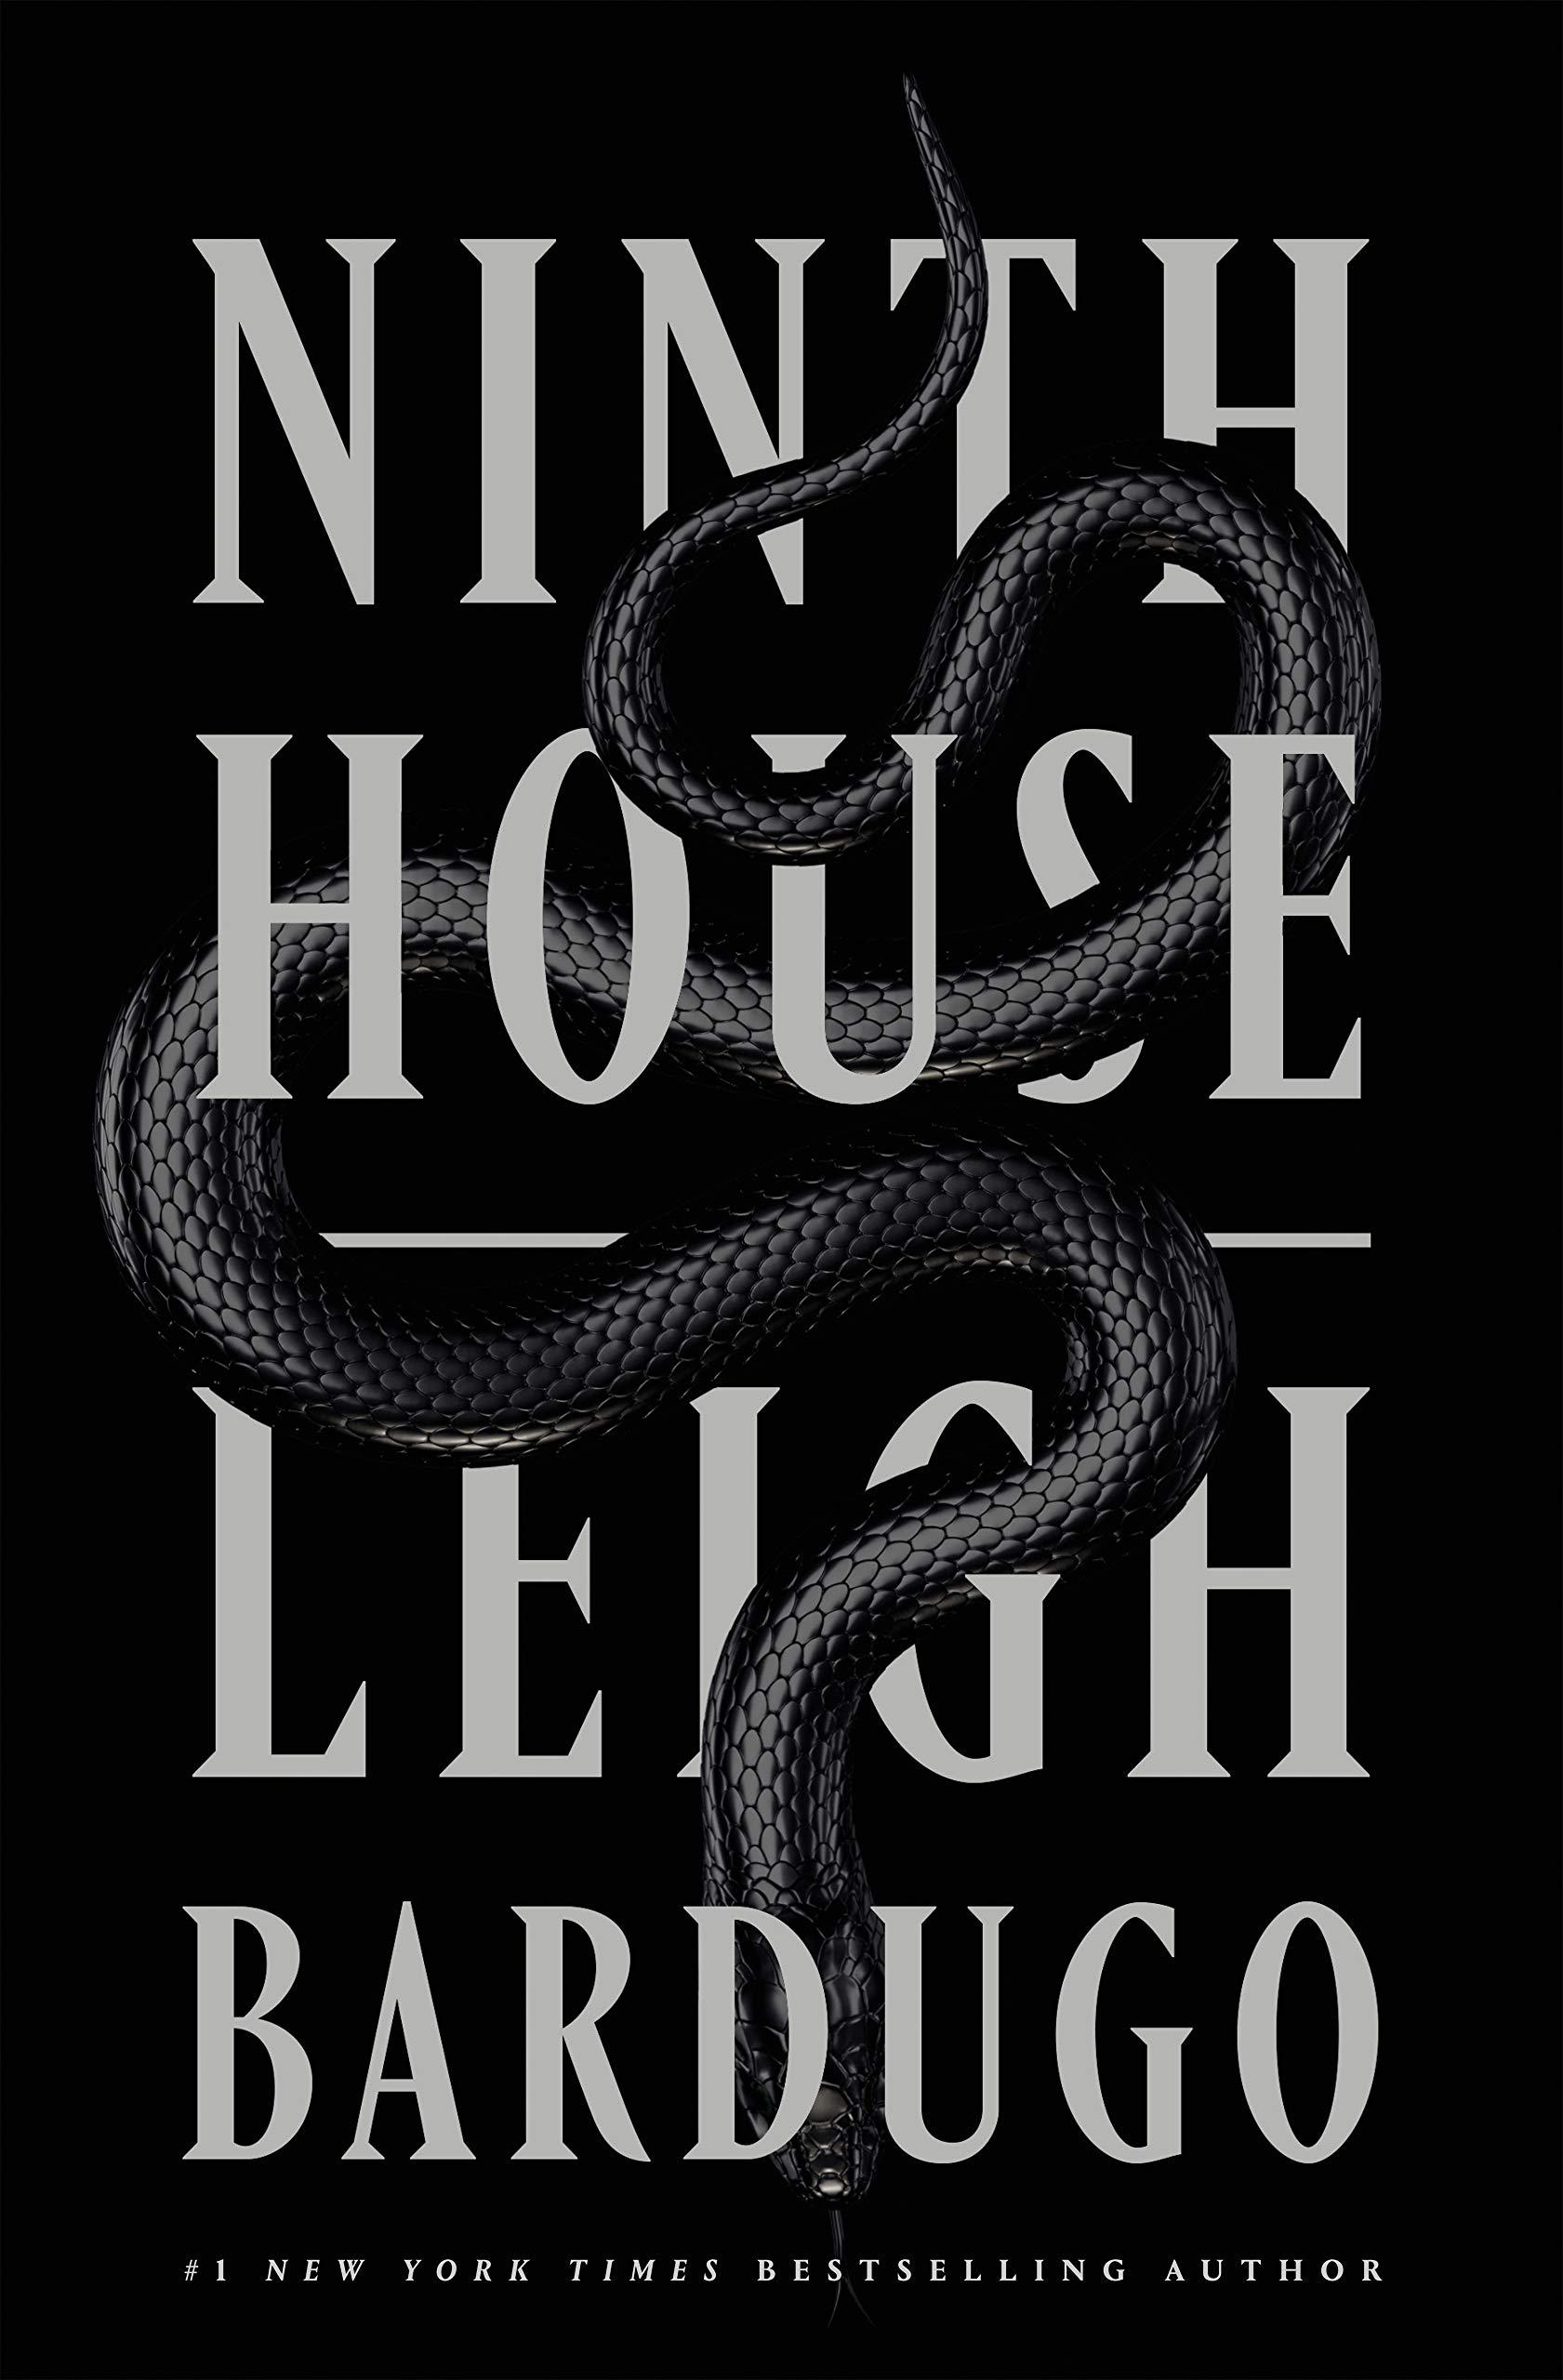 Ninth House by Flatiron Books